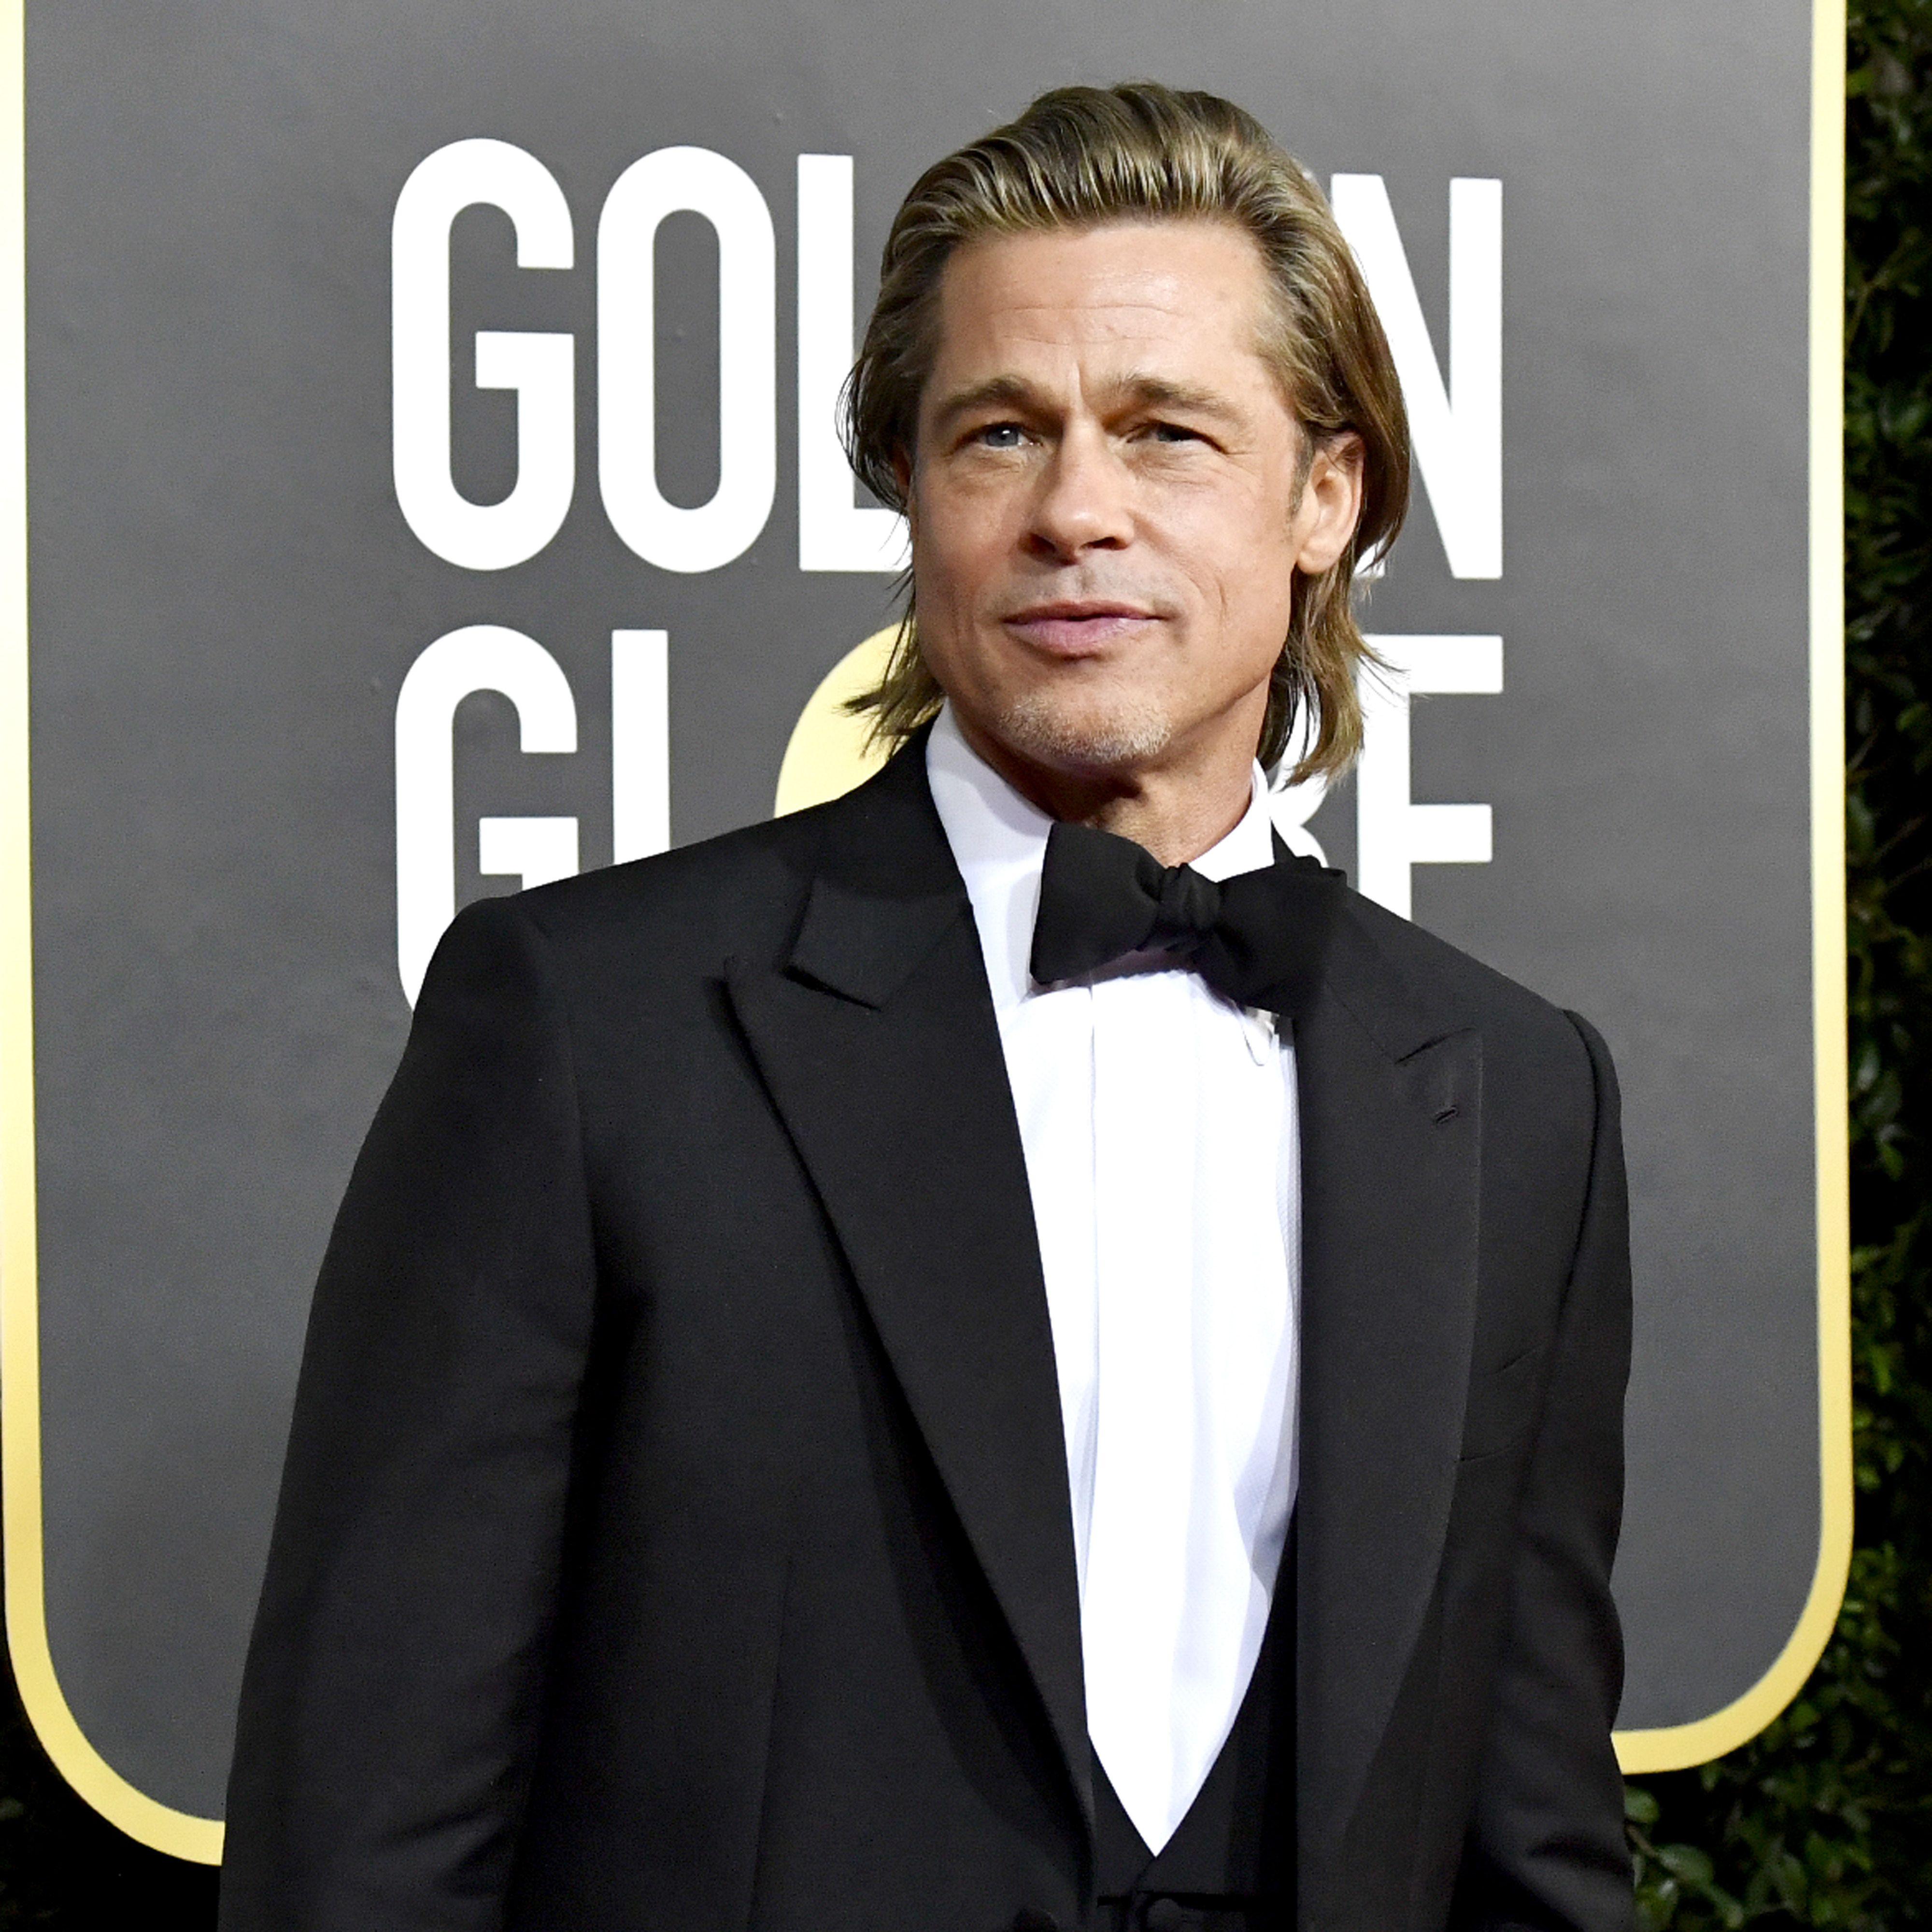 Brad Pitt has perfect response to having run-in with ex Jennifer Aniston at Golden Globes